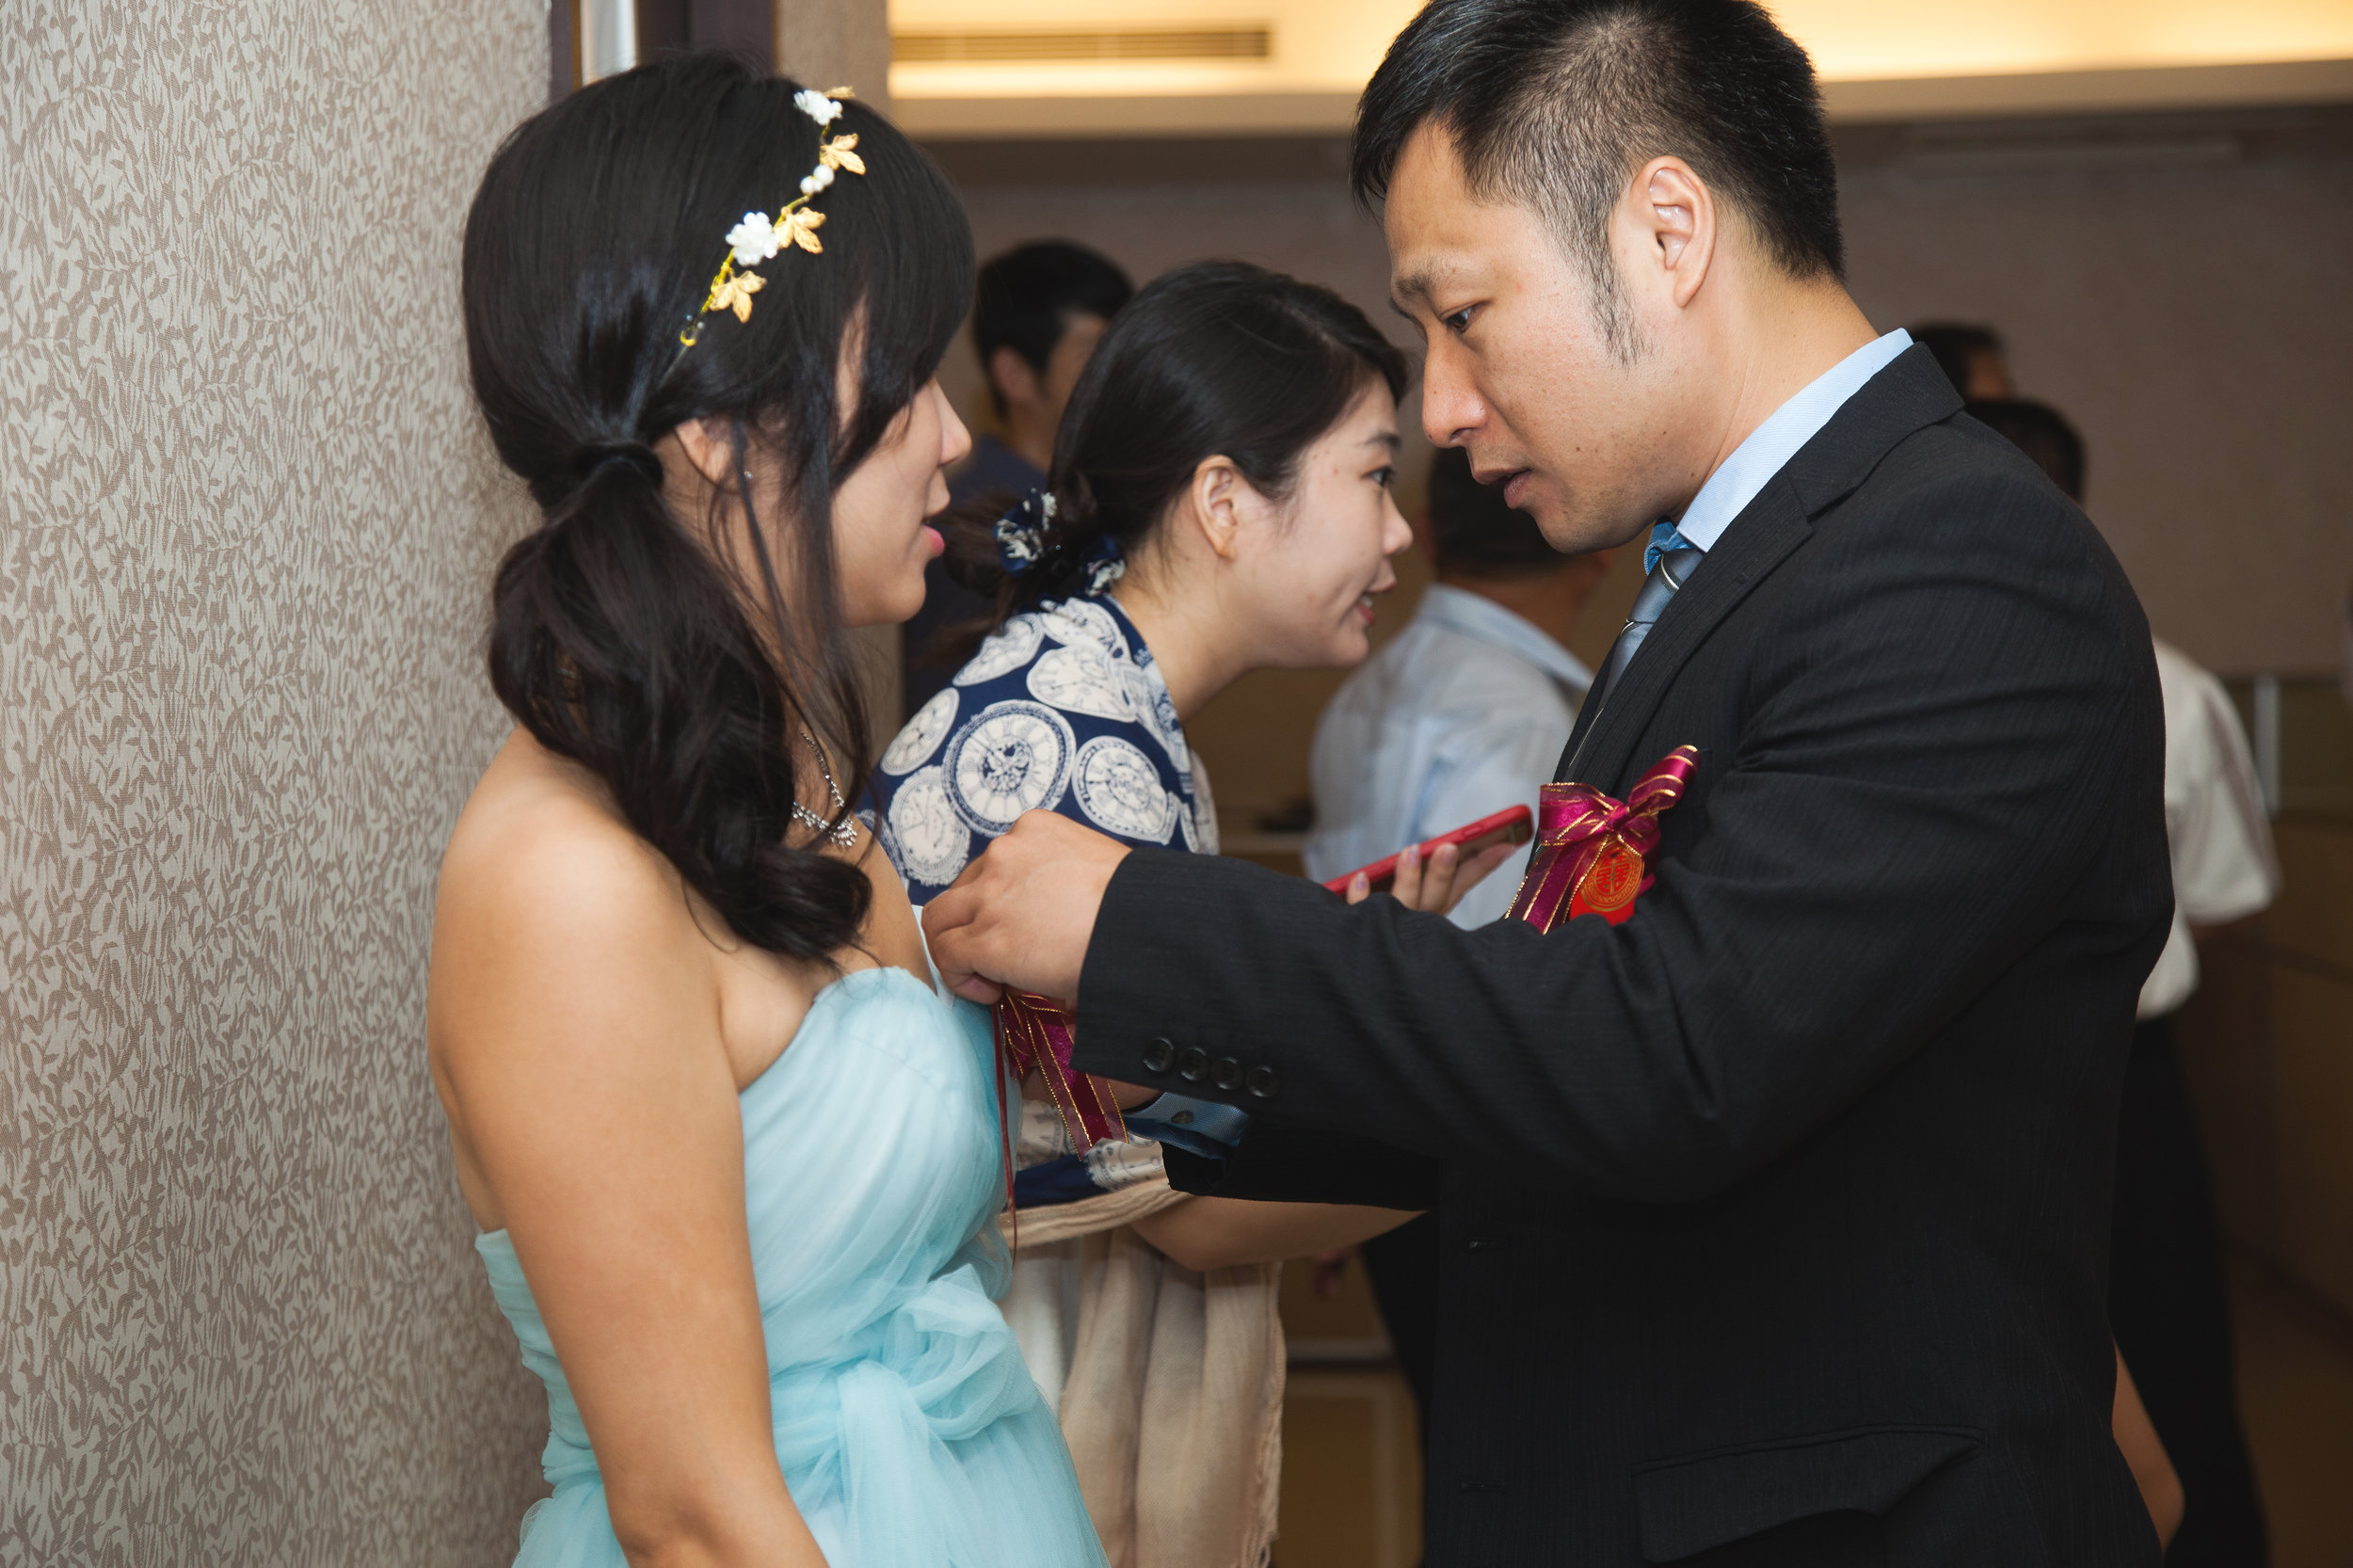 [JC]CREATIVE 女性攝影師 北投儷宴會館 補請台灣WEDDING    自然風格 台北婚攝推 女婚攝  桃園婚攝   圖像00081.JPG